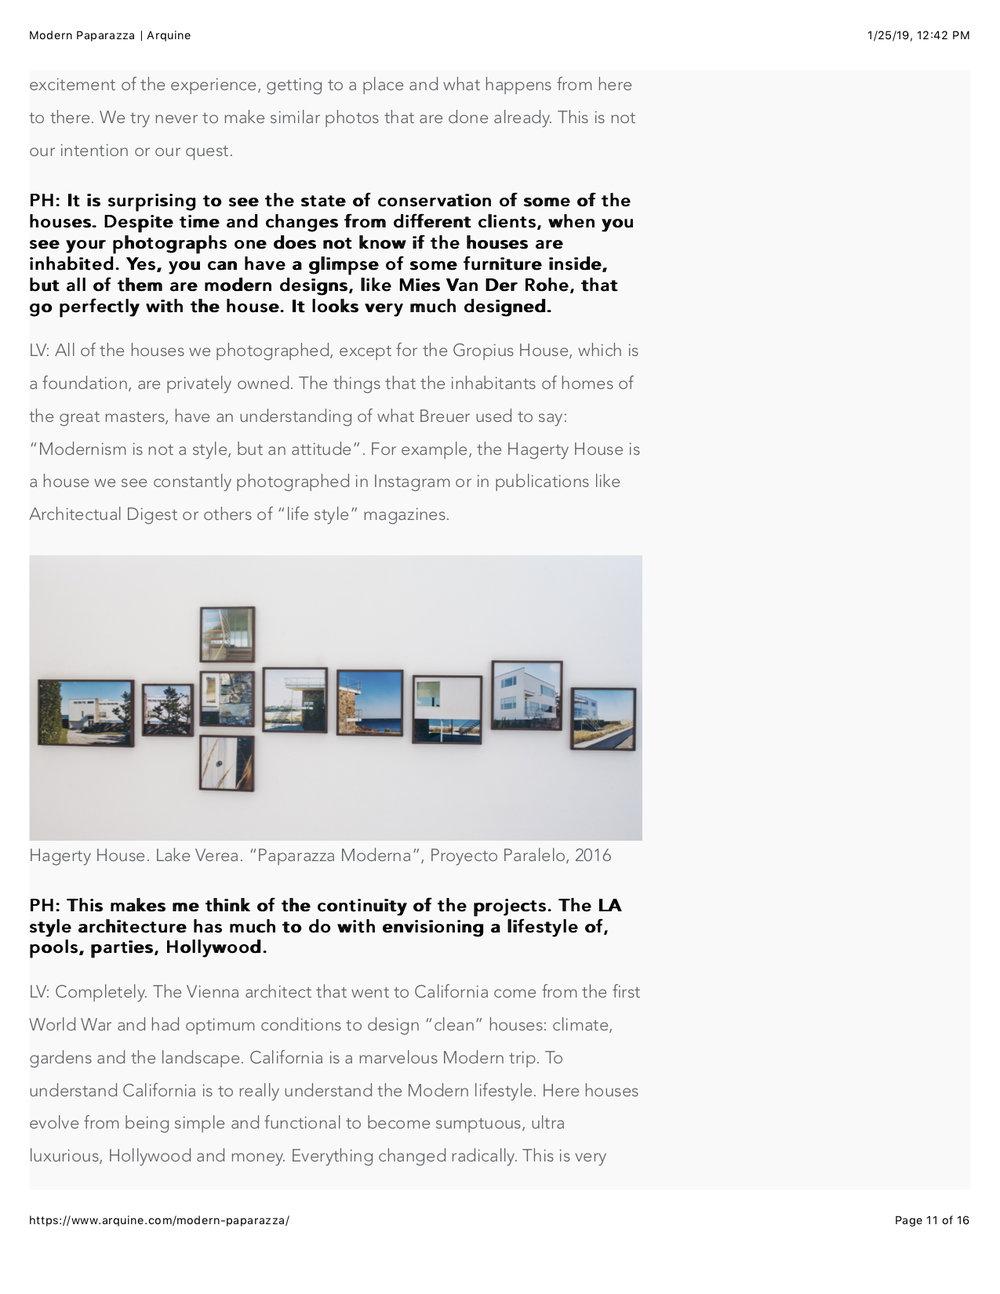 Modern Paparazza | Arquine.11.jpg